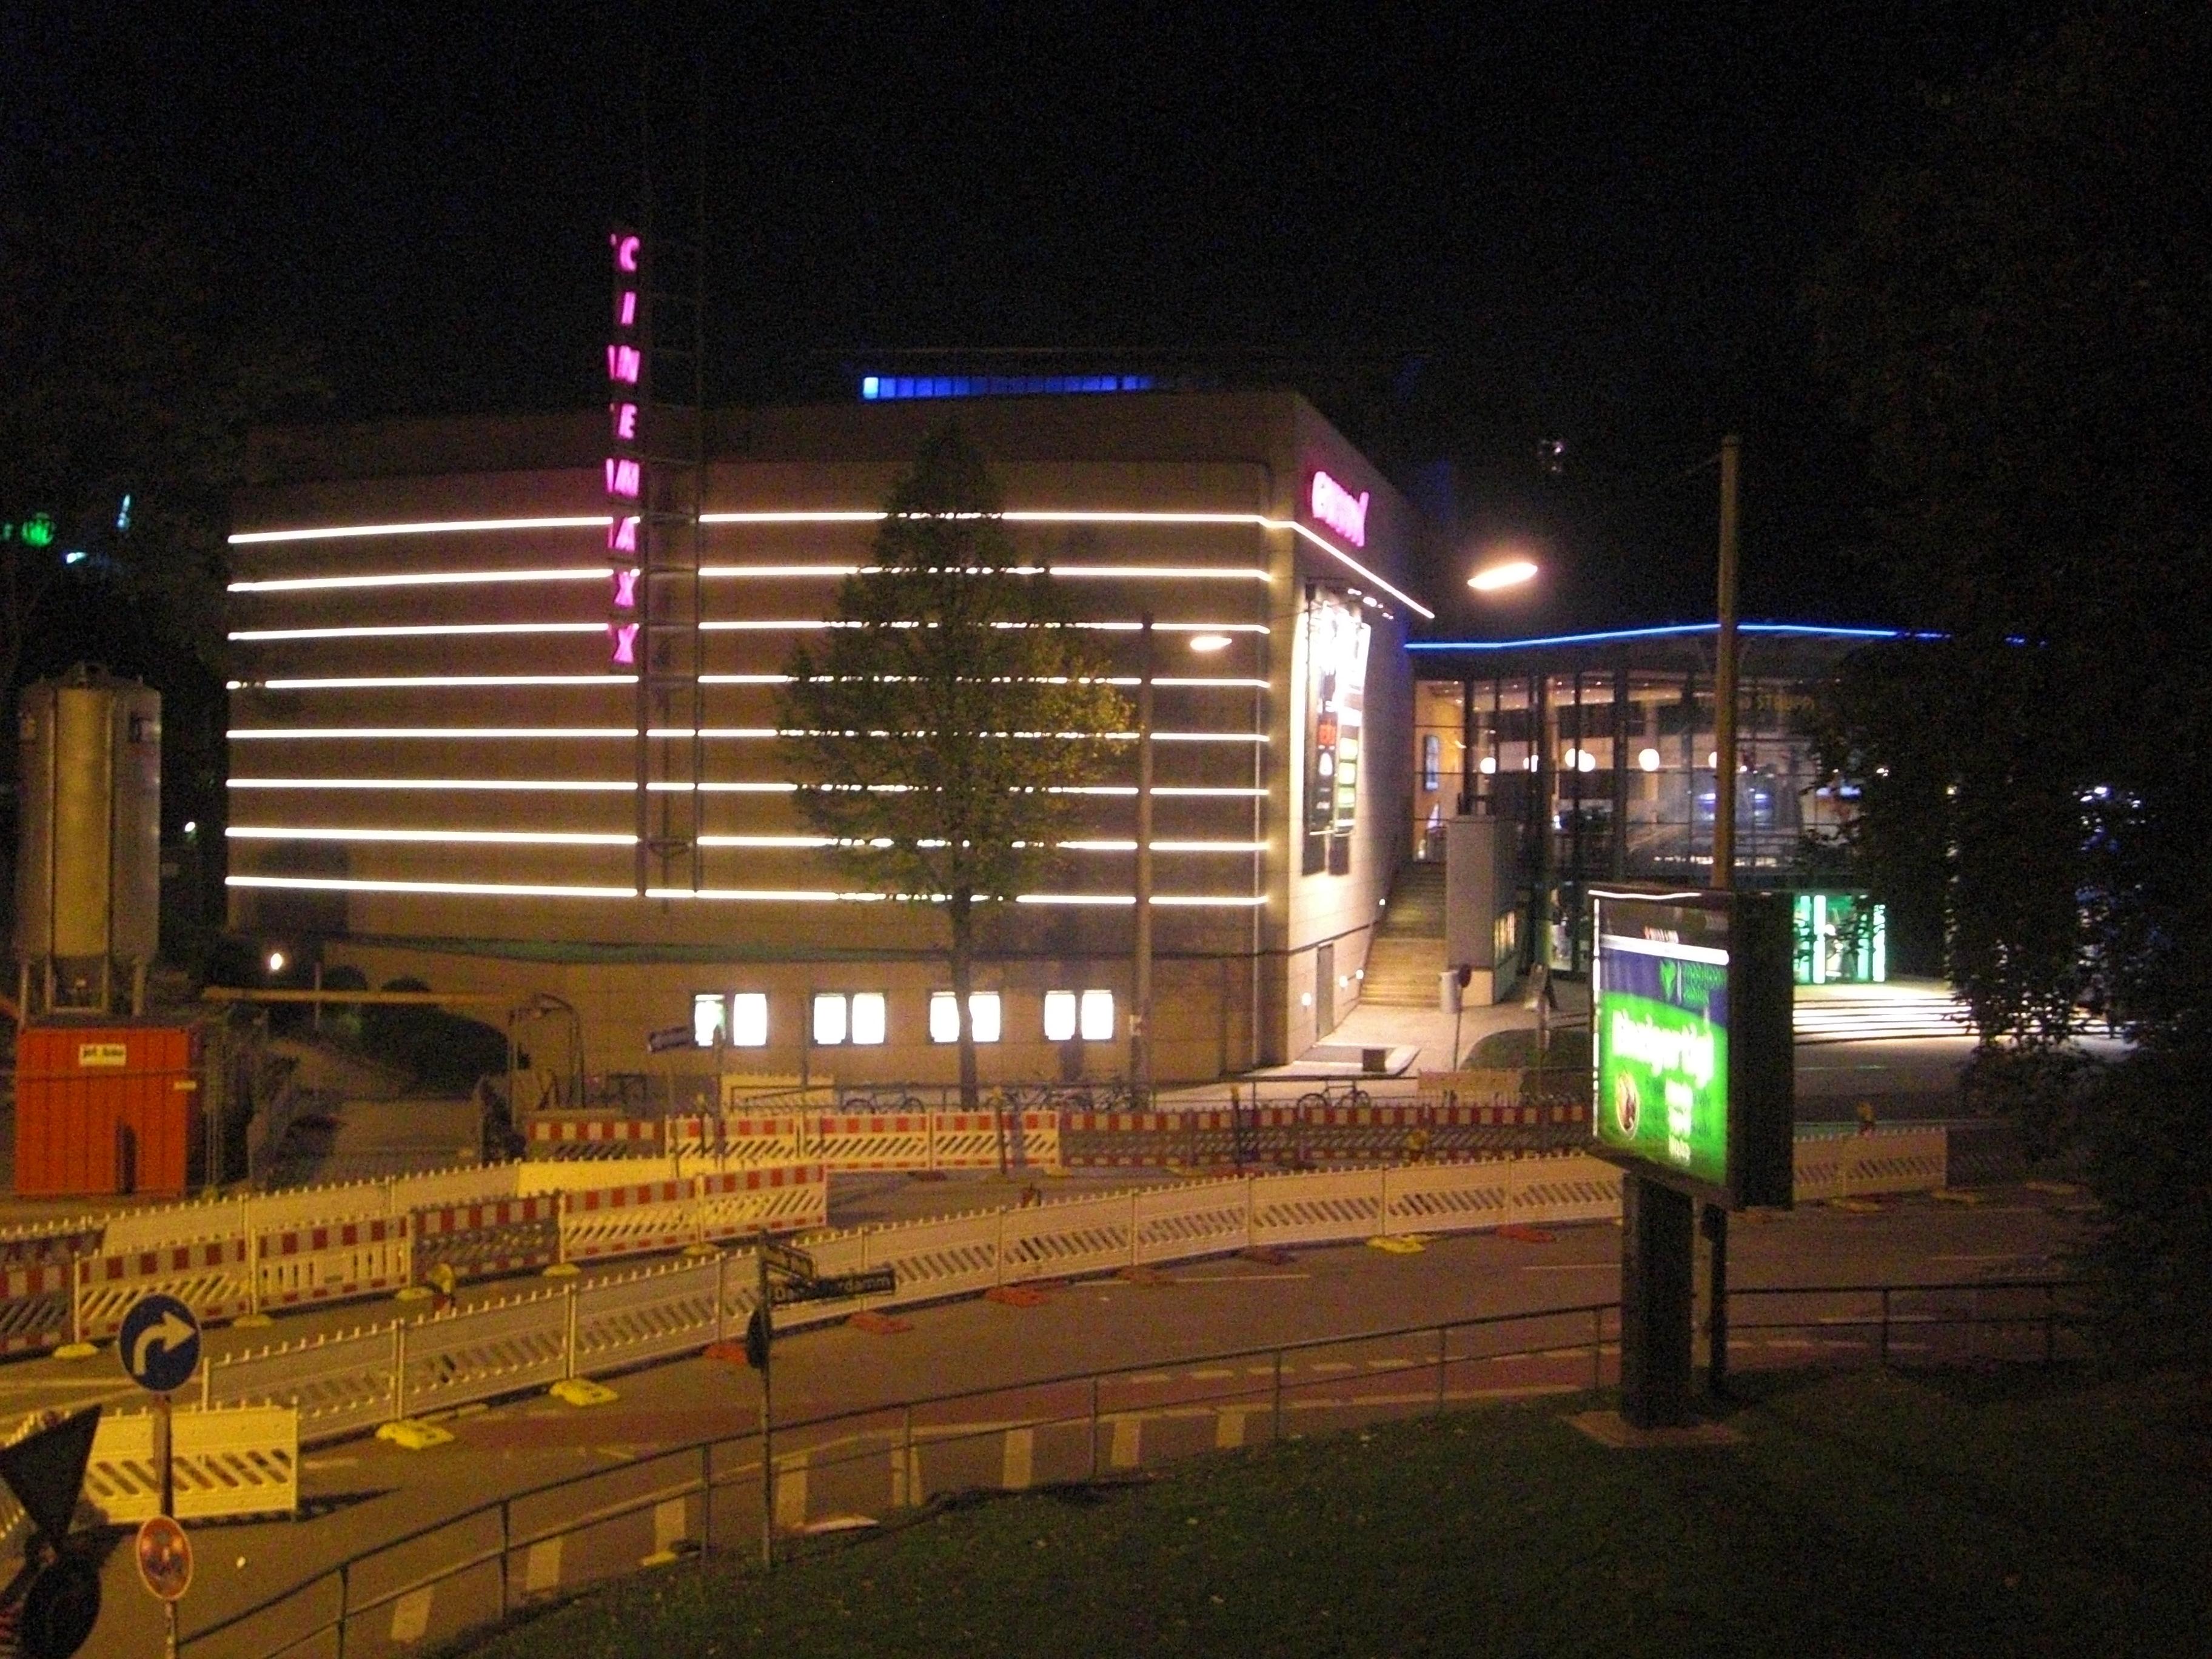 Cineplex Hamburg Dammtor